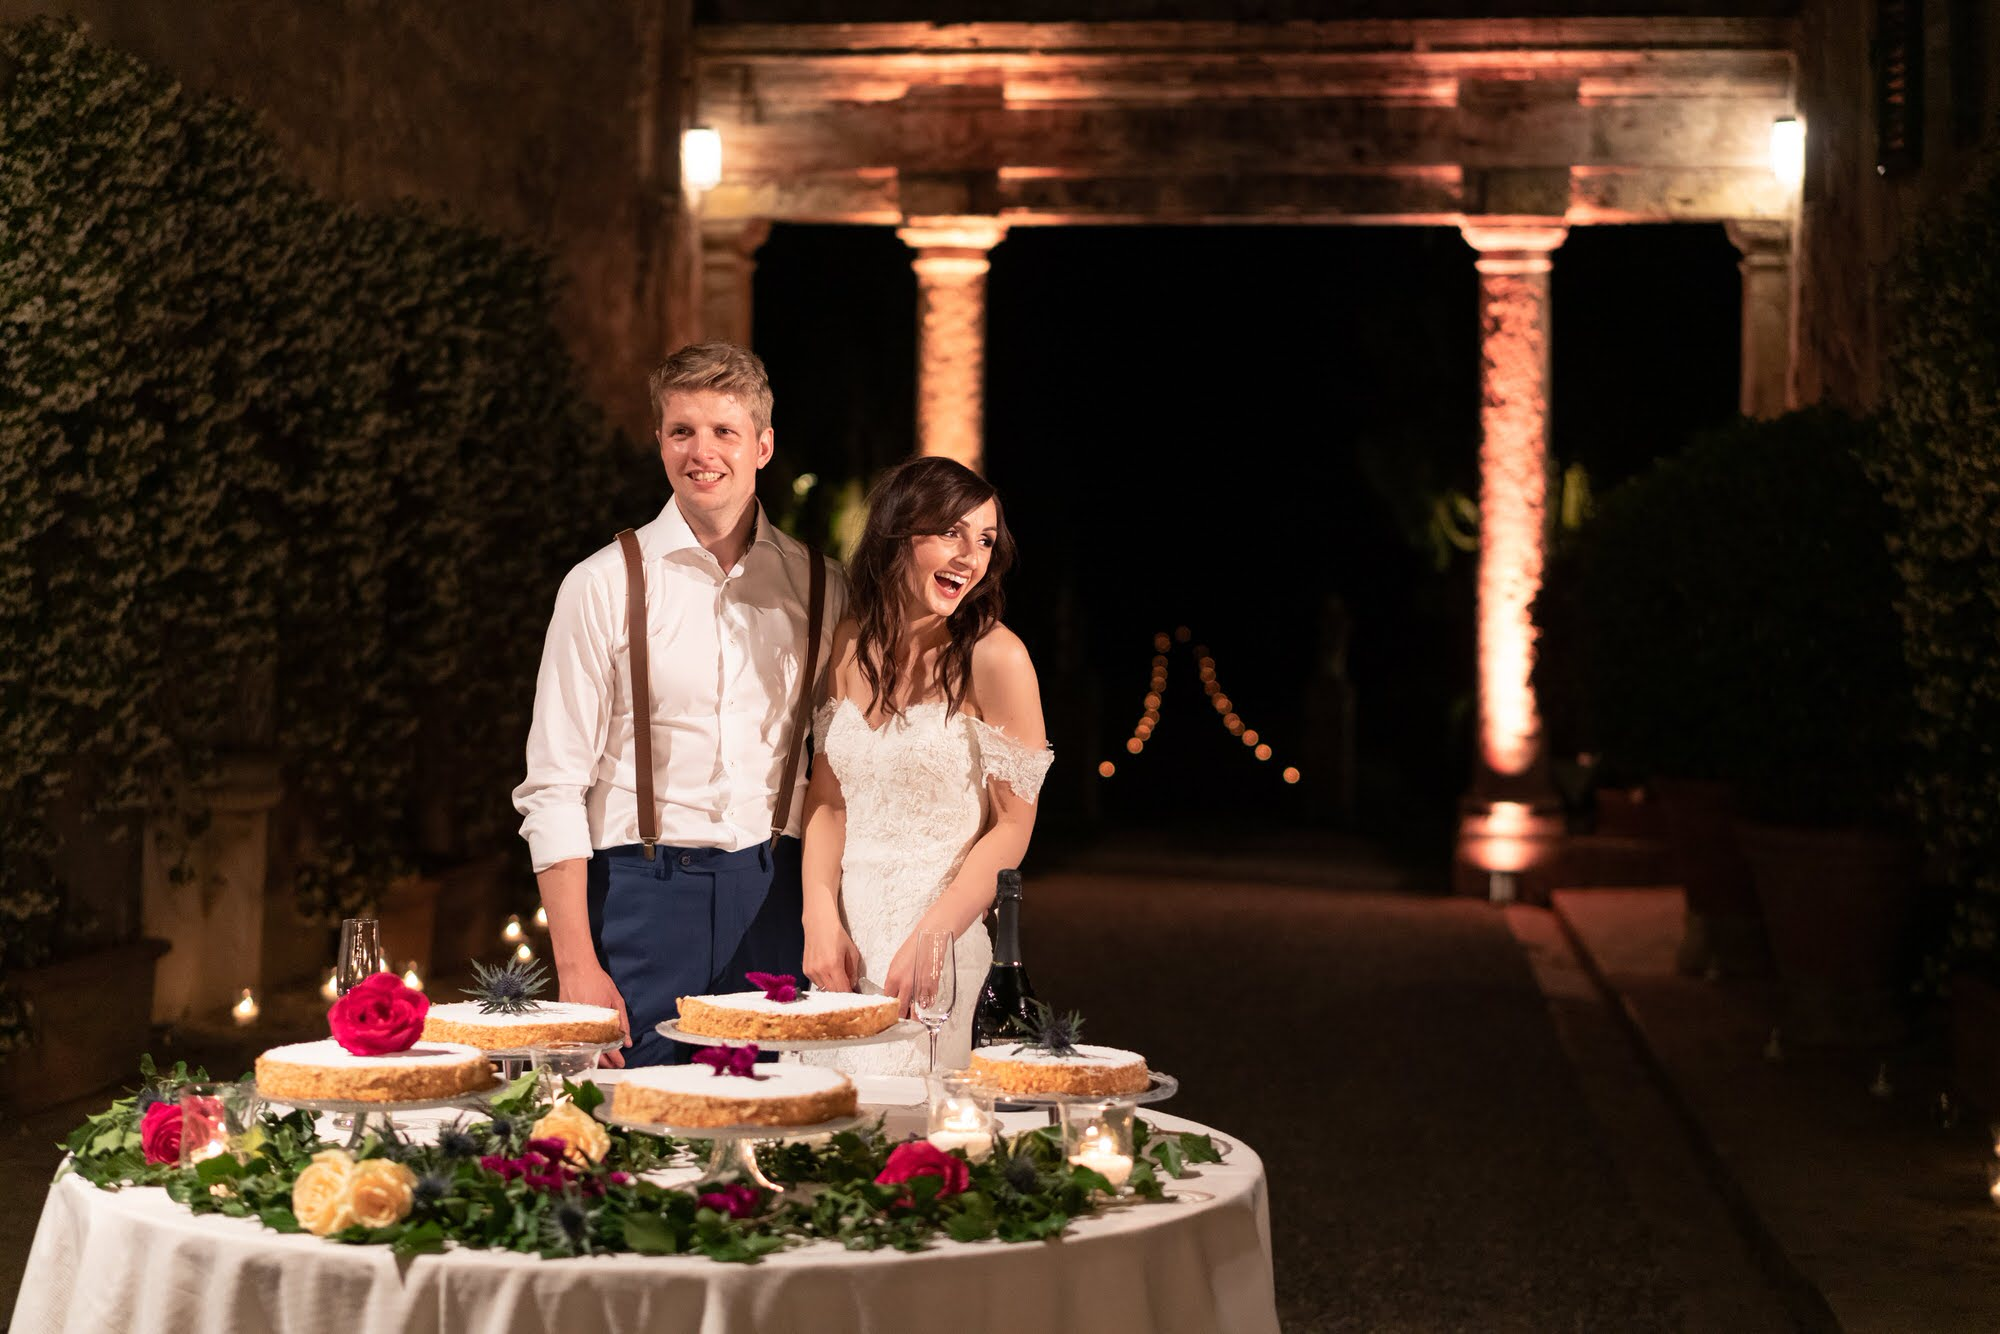 Destination wedding in Tuscany: Lauren & Paul